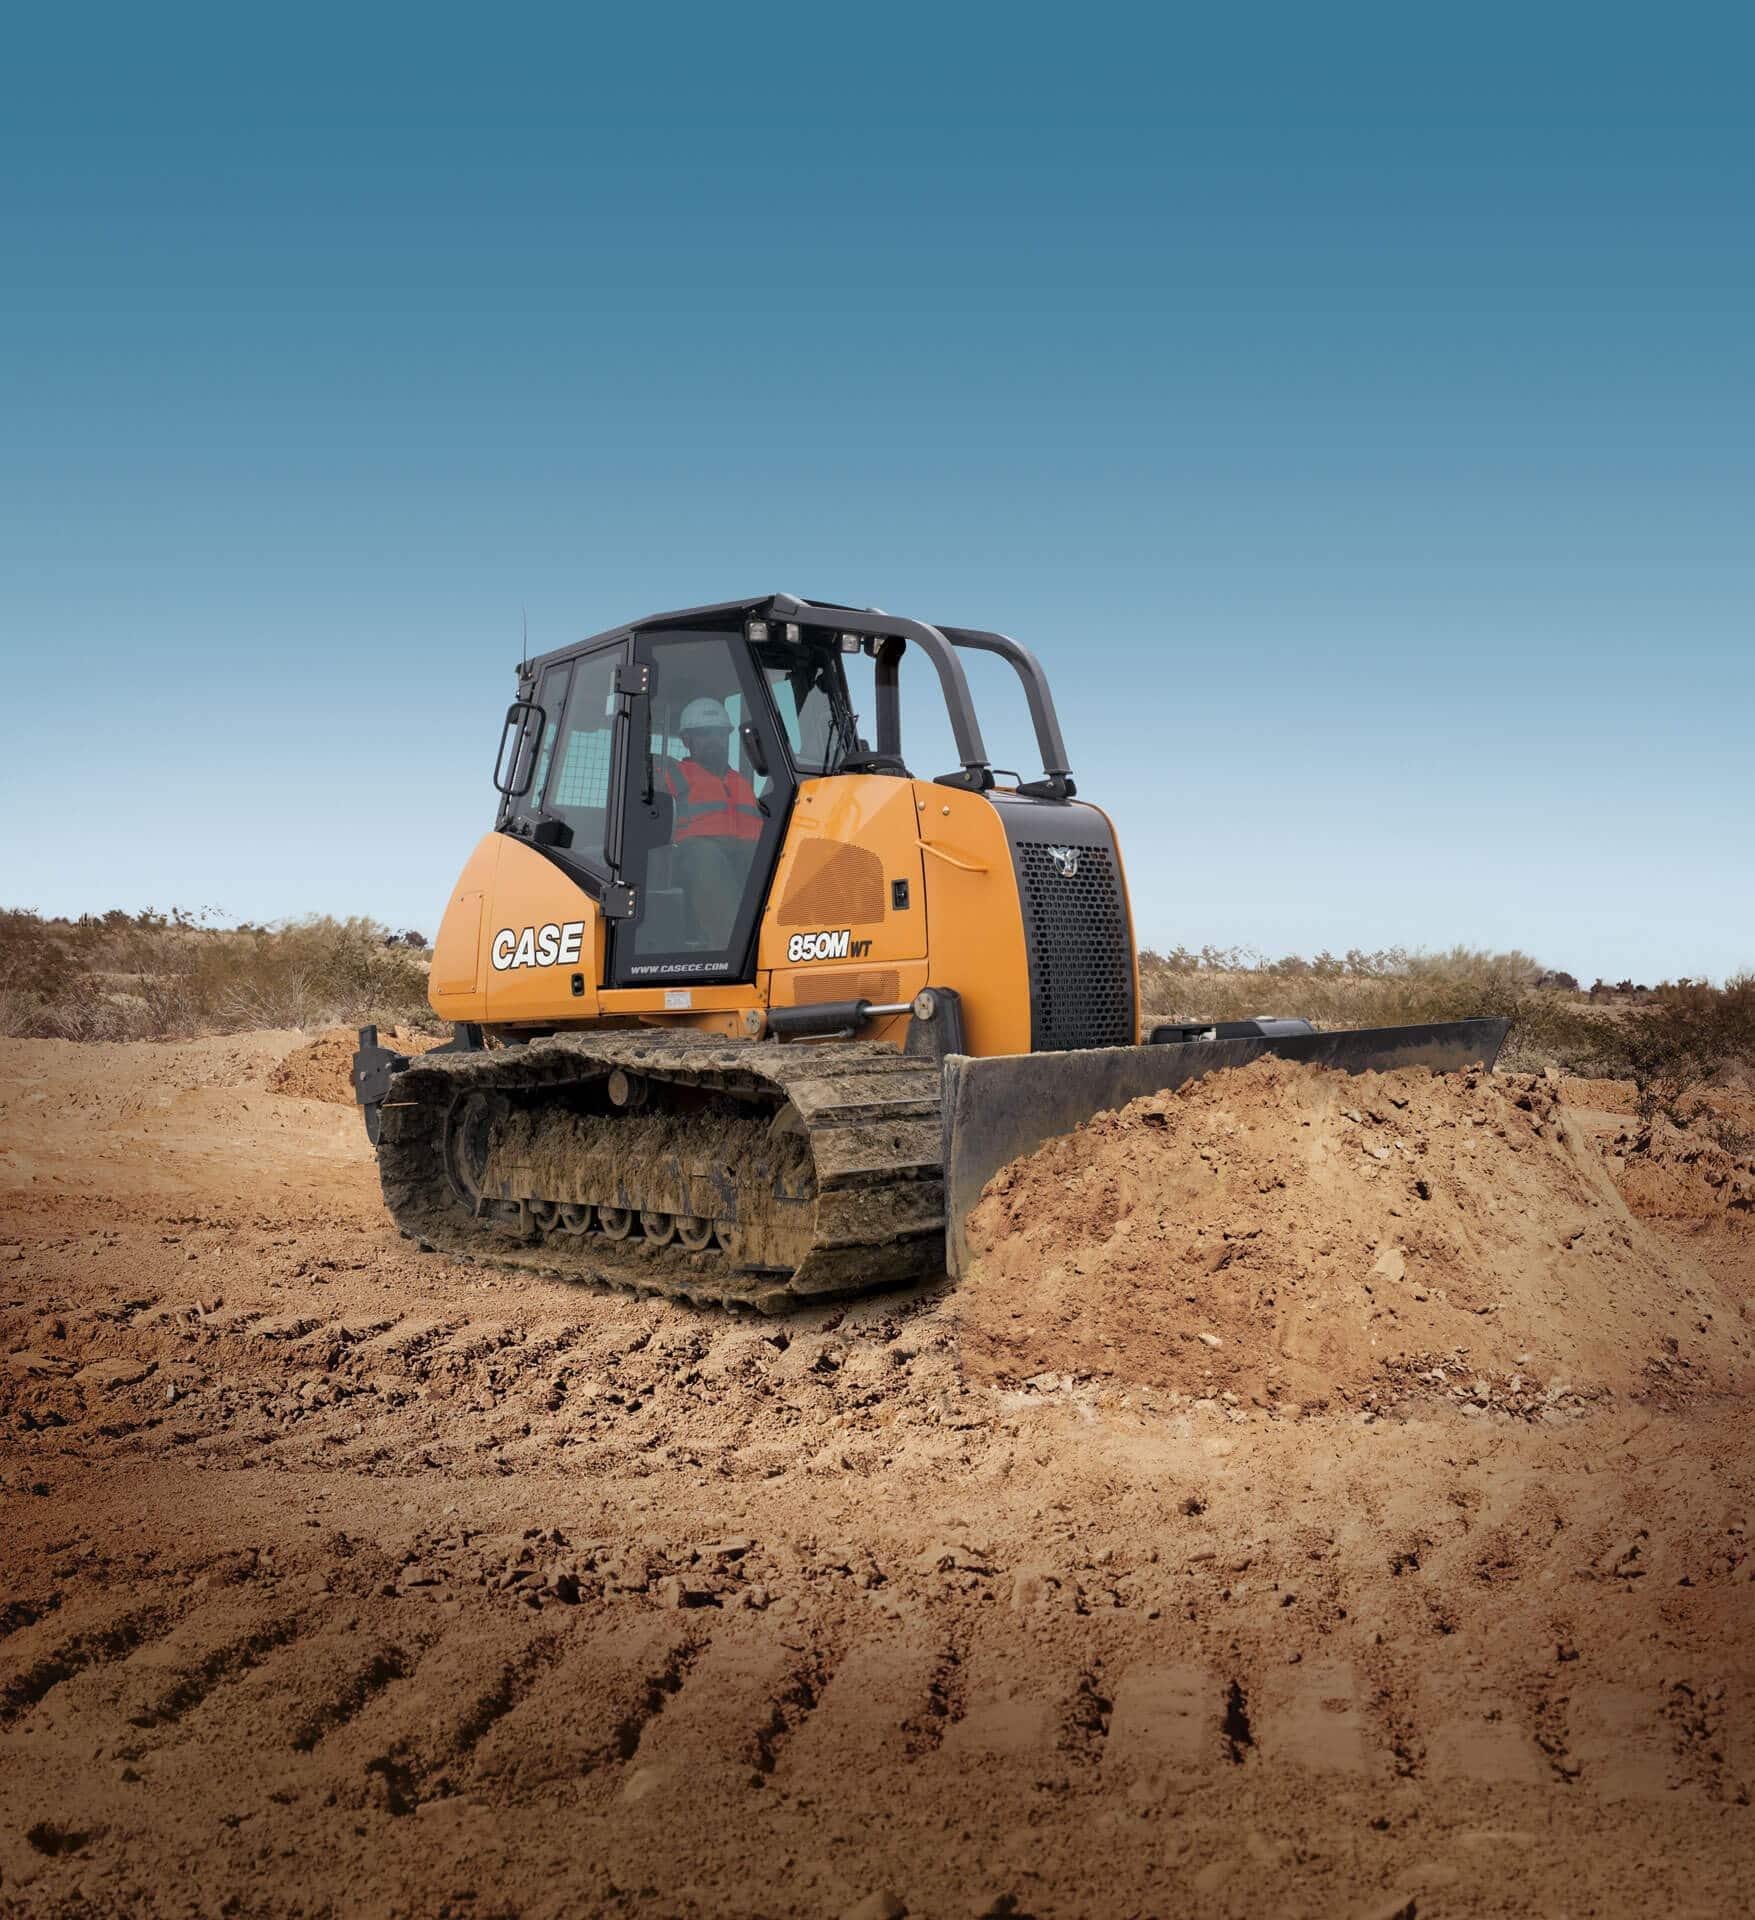 case 850m dozer case construction equipment rh casece com Case 430 Tractor Wiring Diagram Case 430 Tractor Wiring Diagram